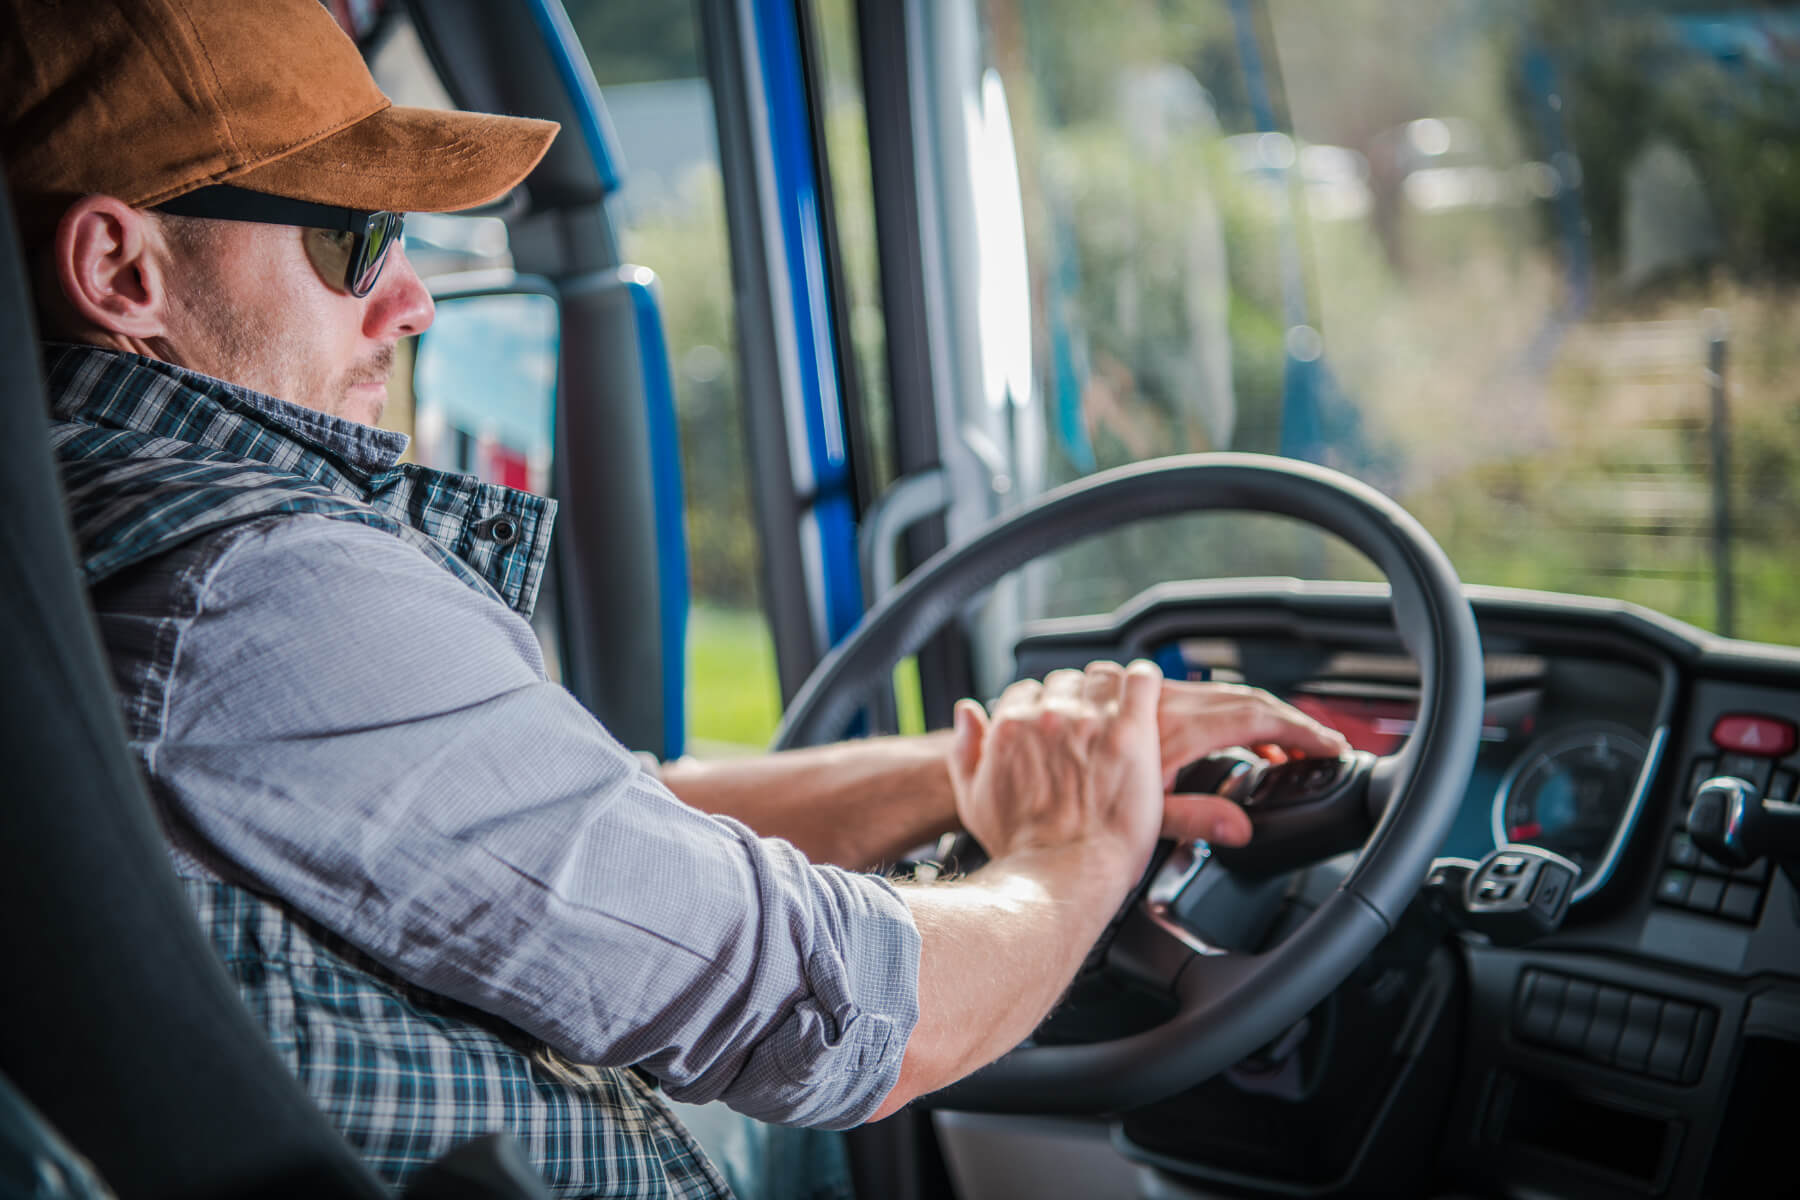 Truck Driver in Cab